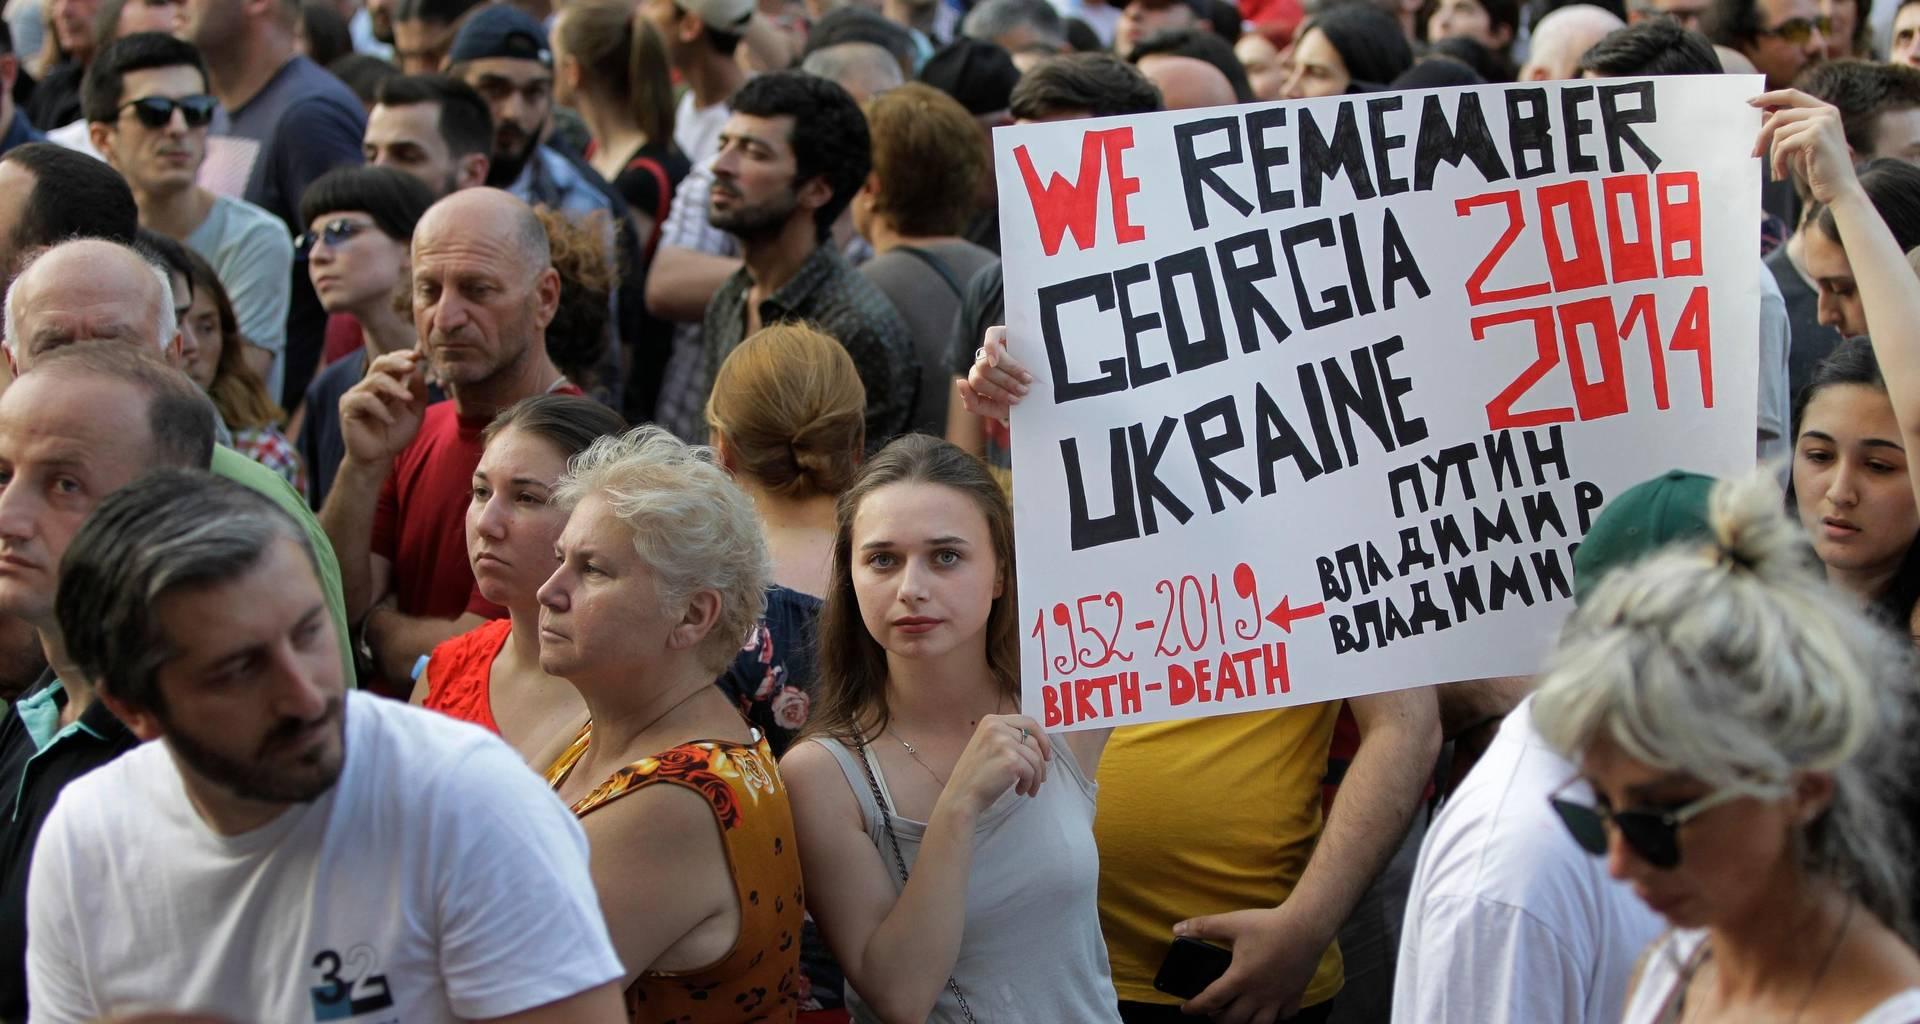 Протестующие перед зданием парламента Грузии. 22 июня 2019 (Фото — AP)